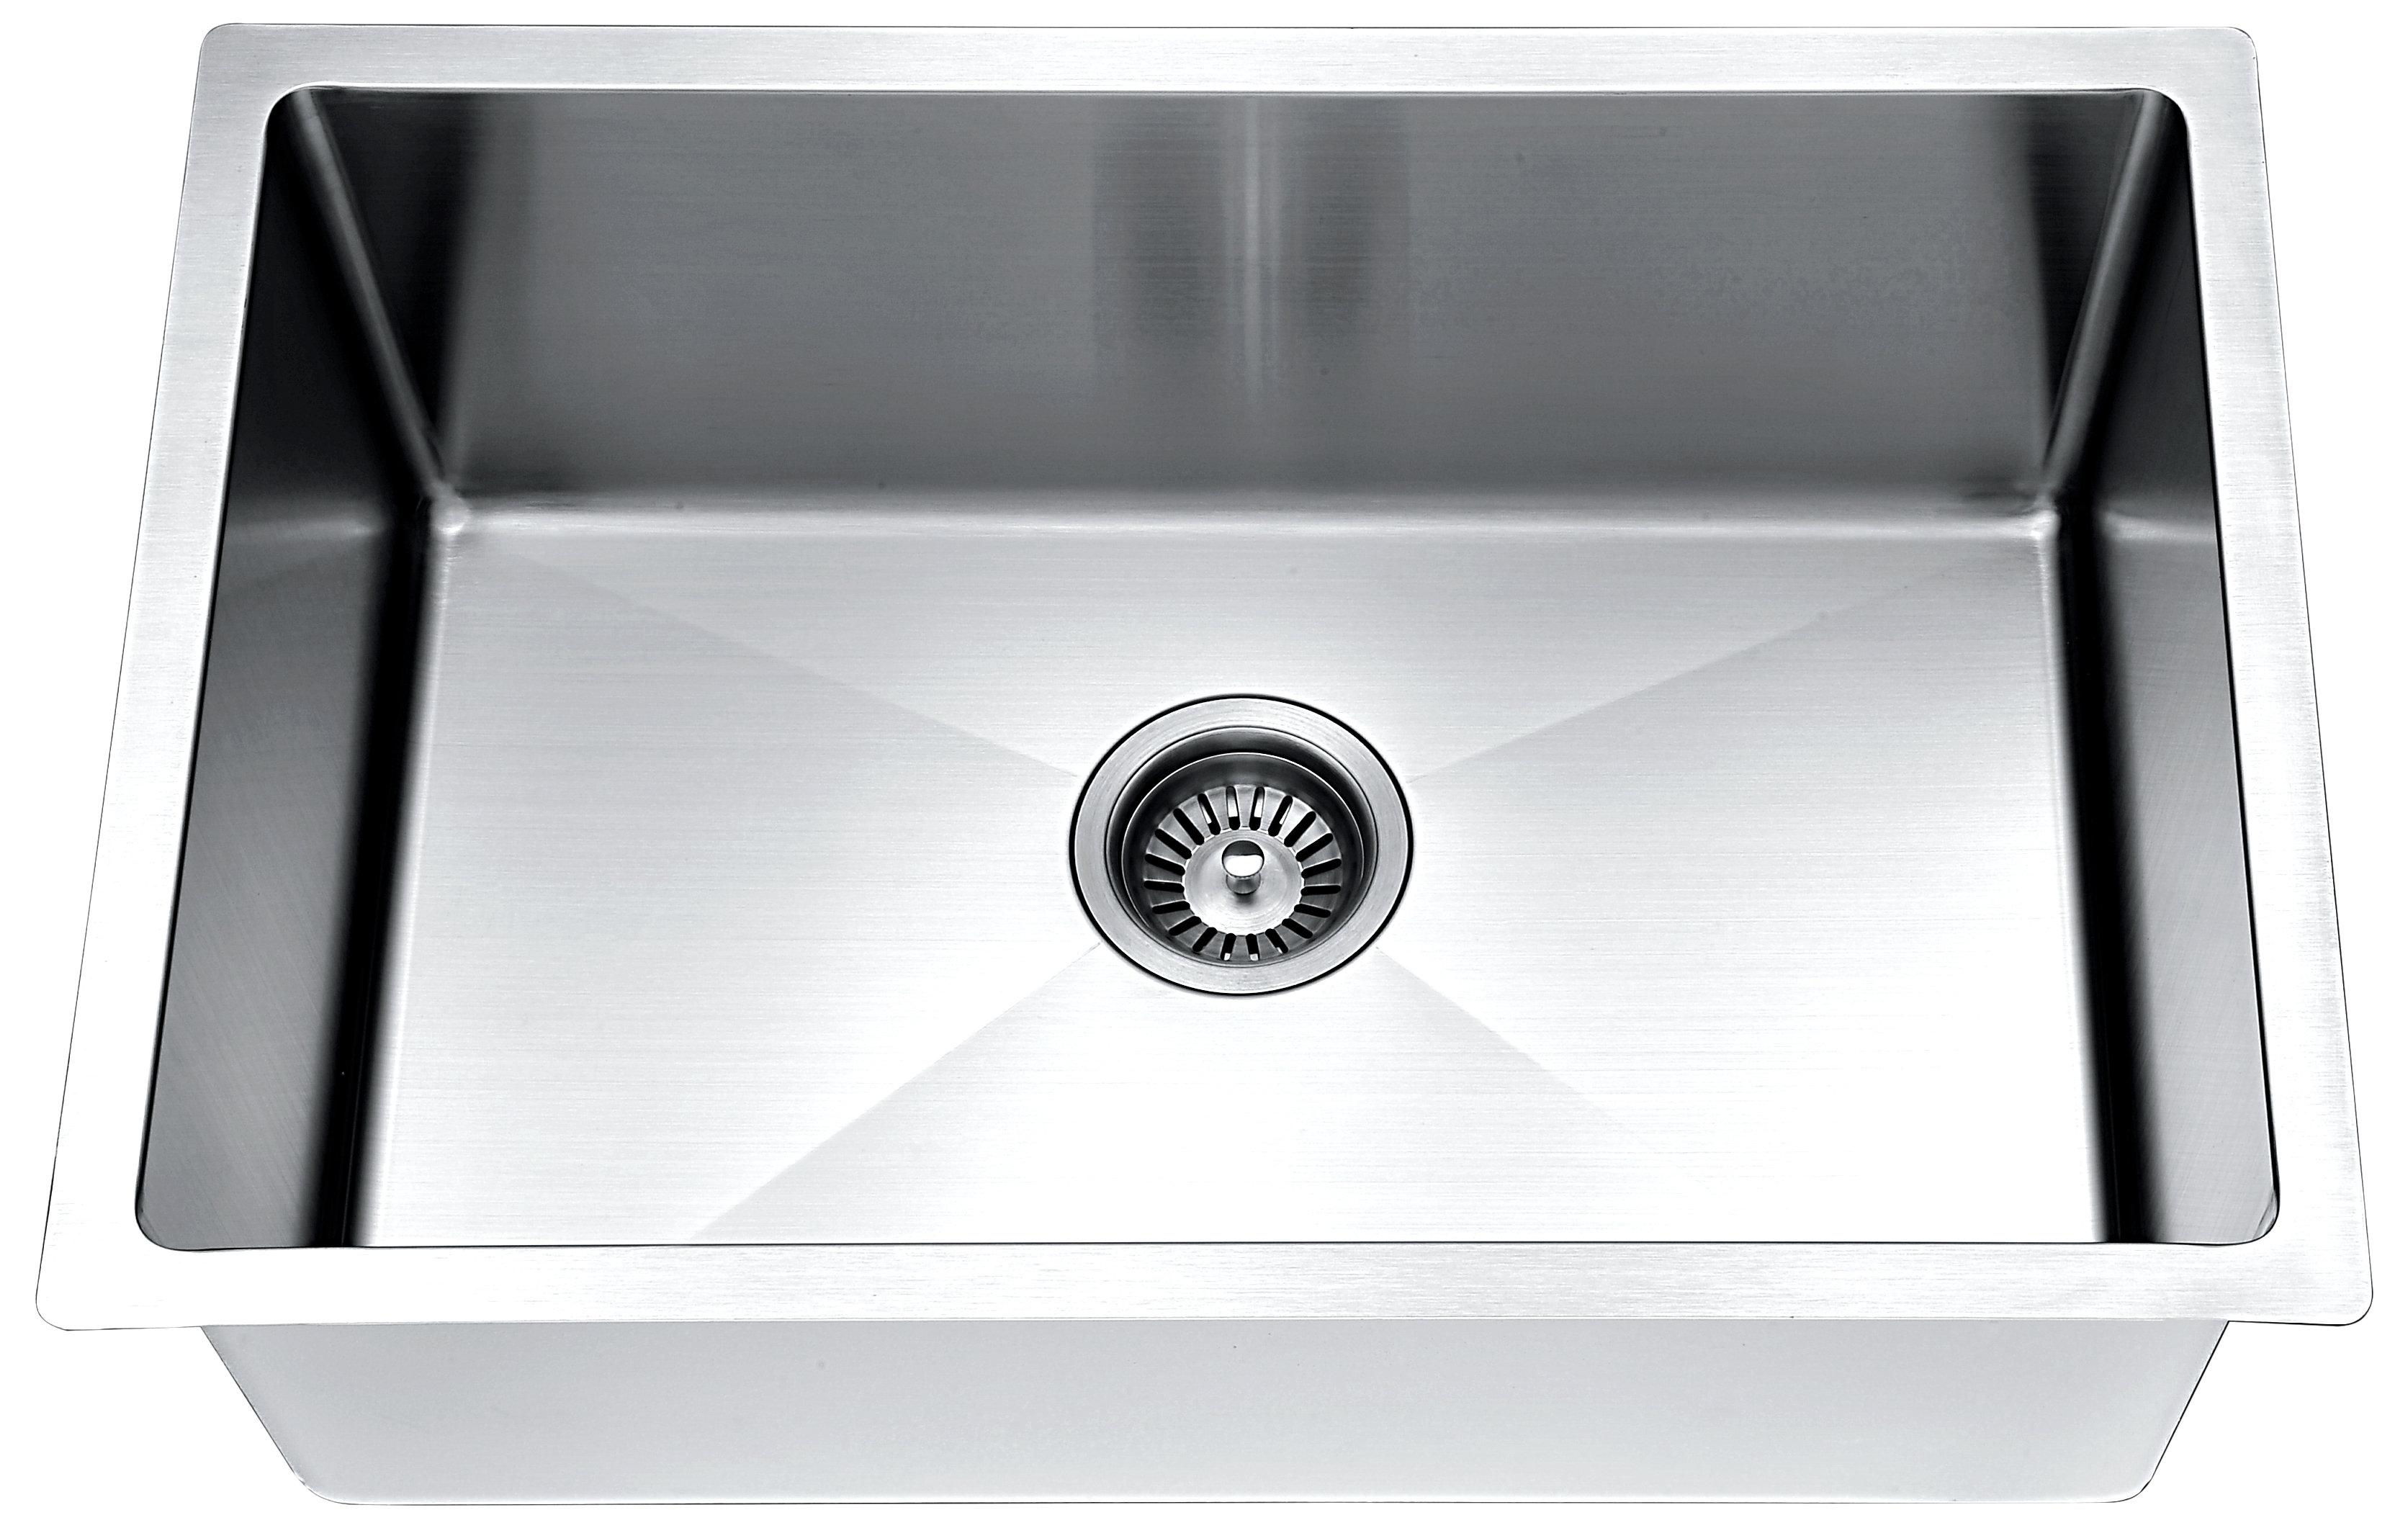 Daweier EST332208 Sink Top Mount Double Bowls 18 Gauge